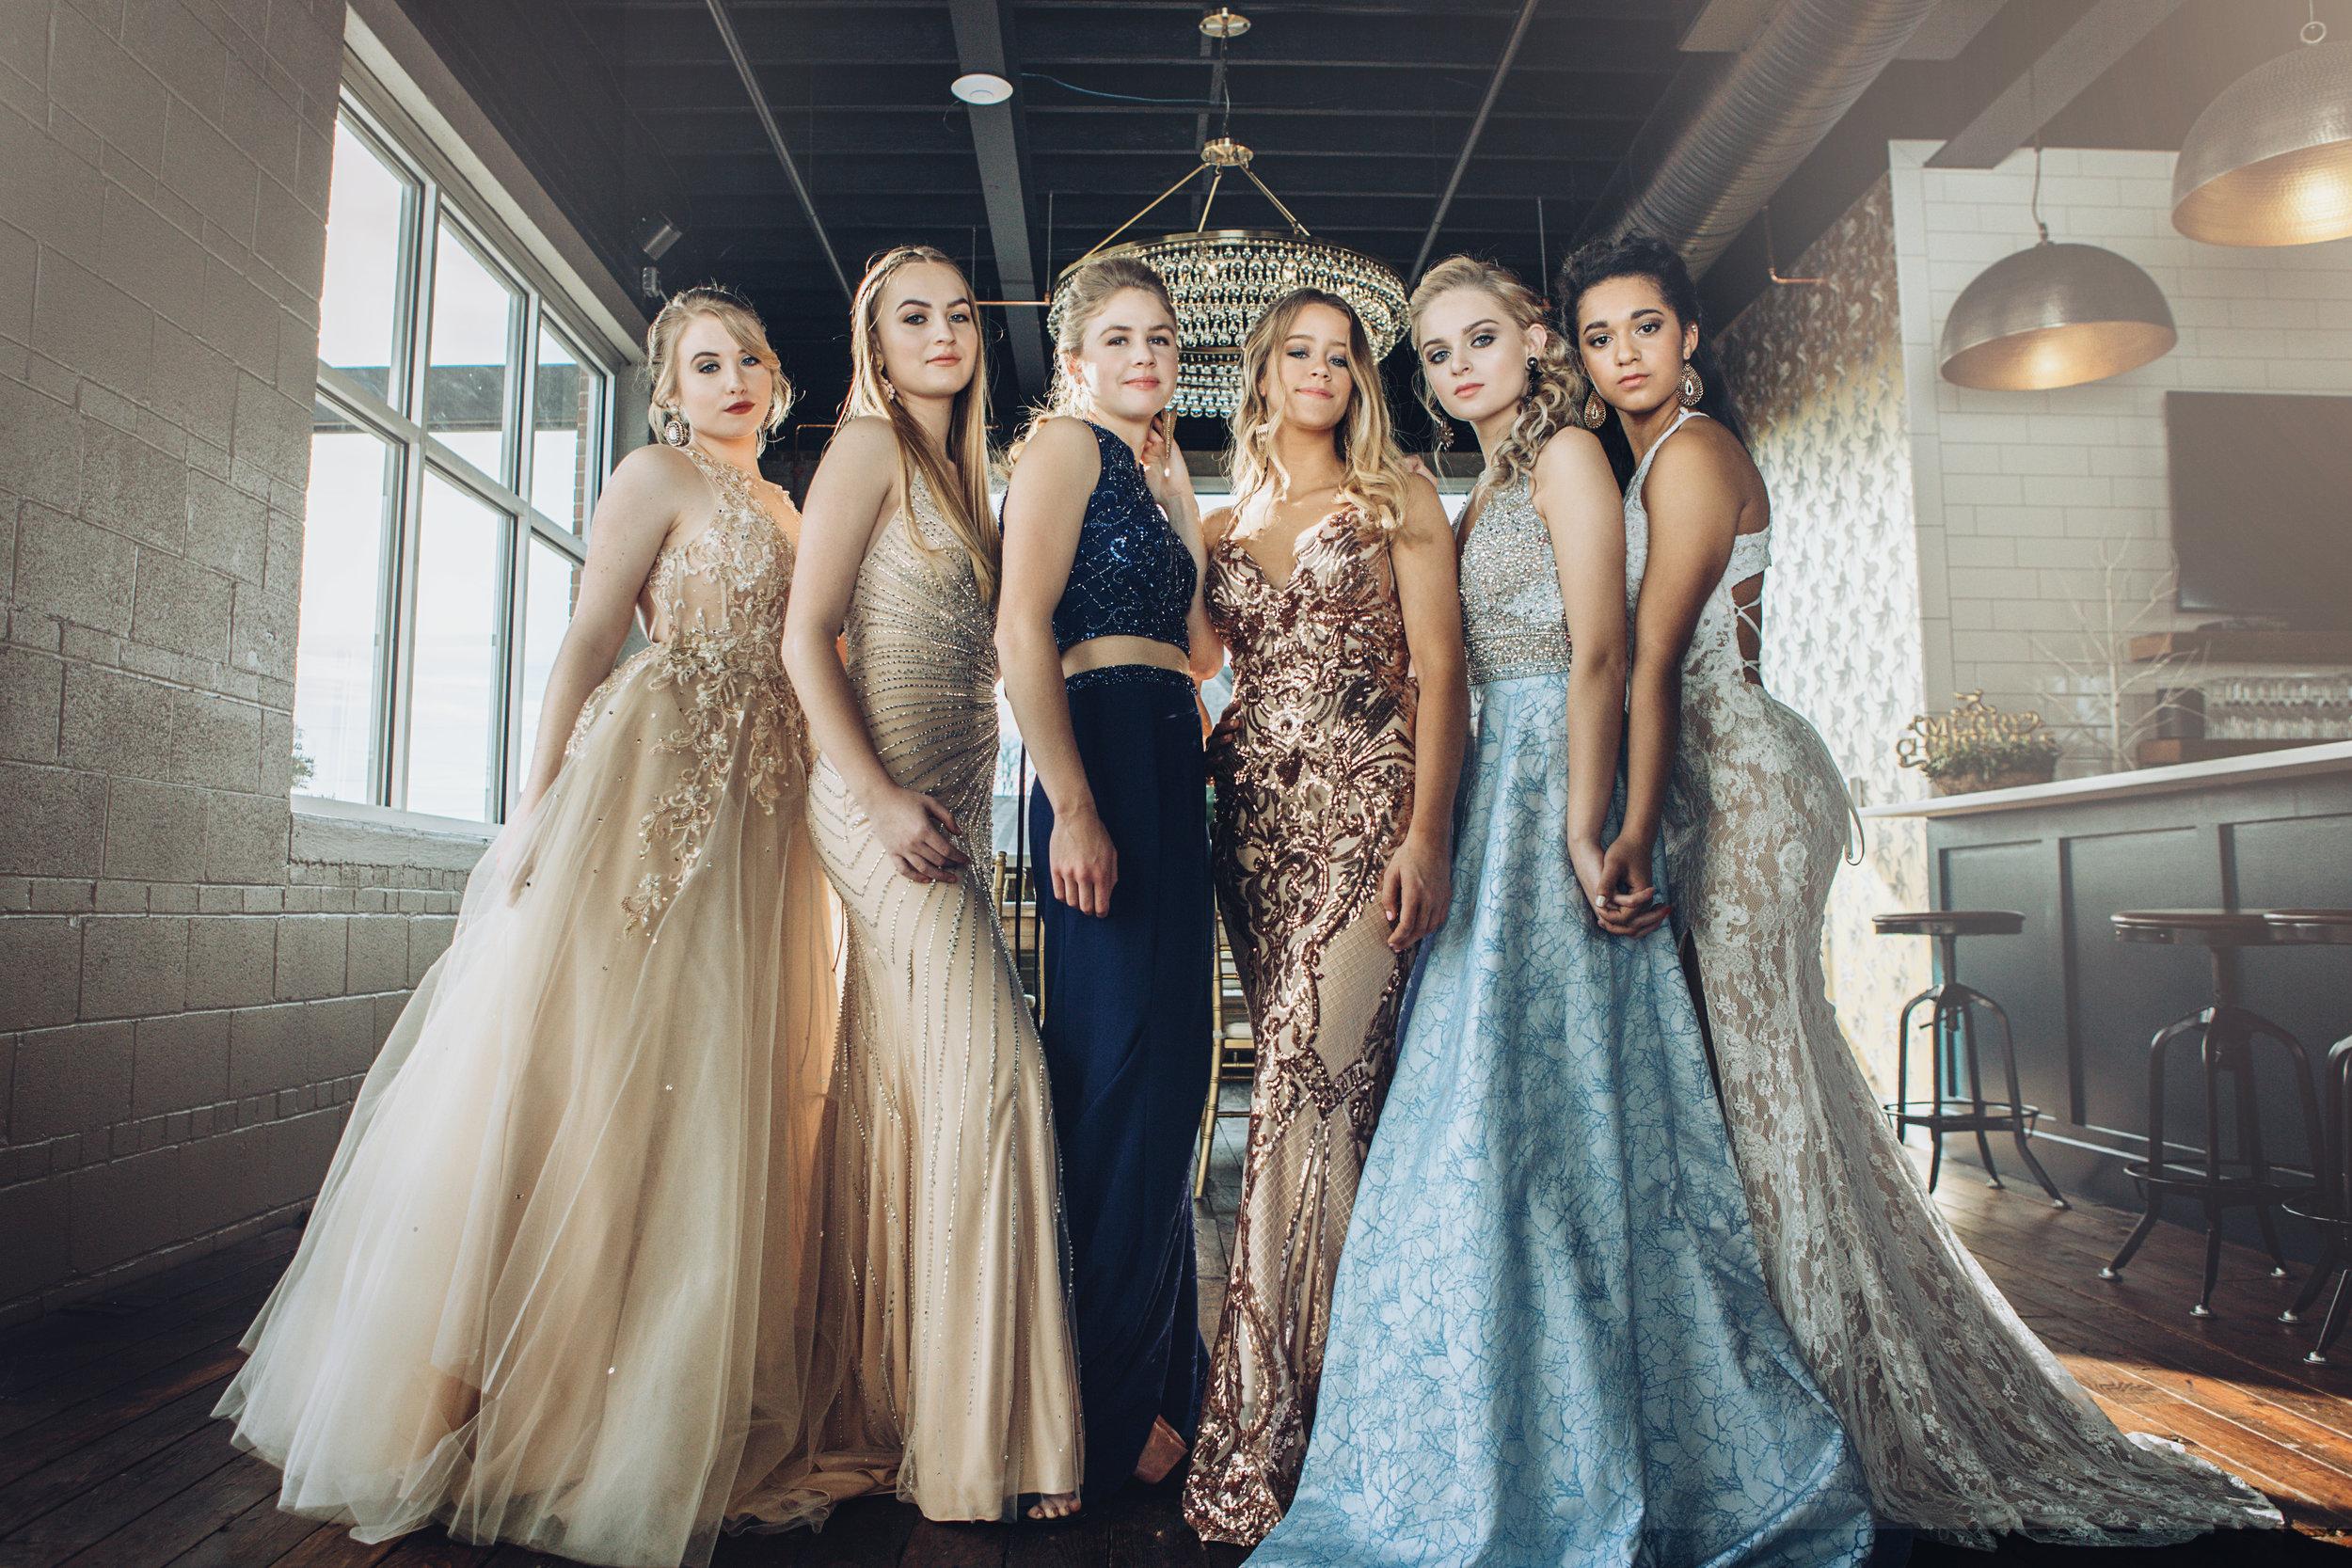 Pretty Team 20's Prom Photo Shoot featuring dresses from J & B Bridal. Location @ Grant Street Loft